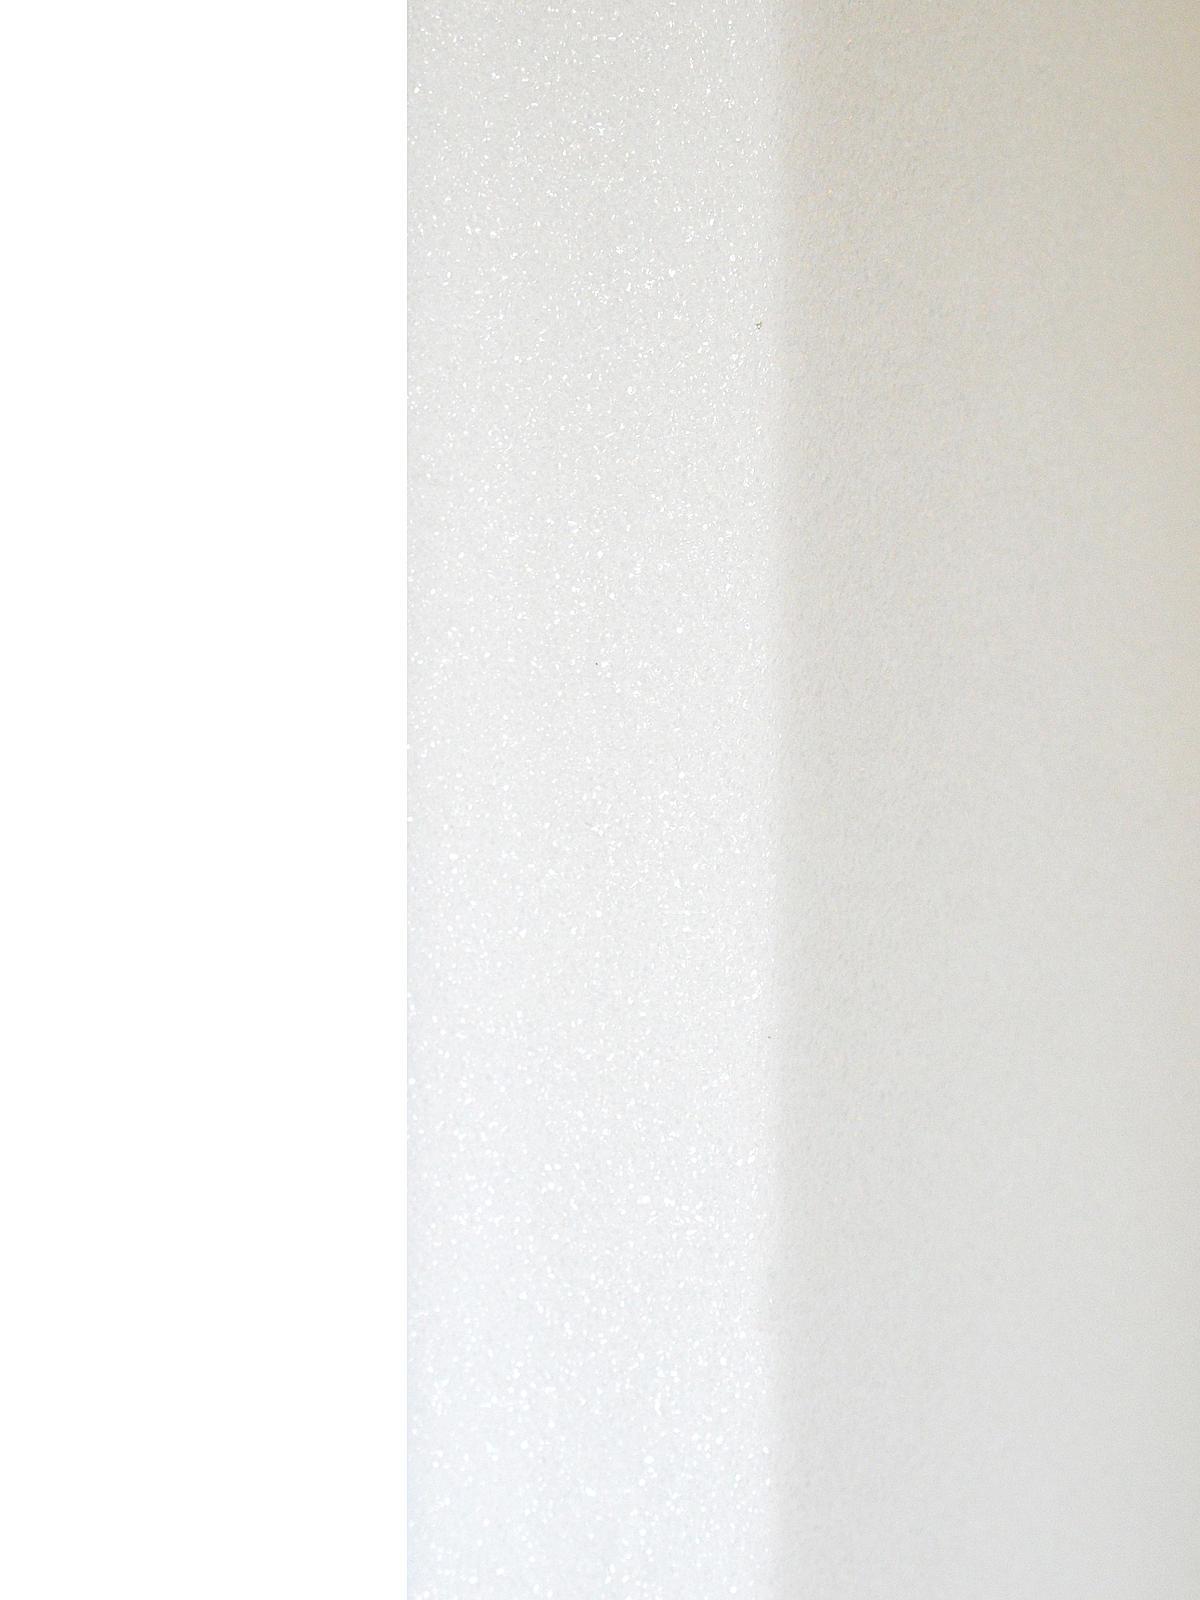 FloraCraft Styrofoam Sheets | MisterArt.com